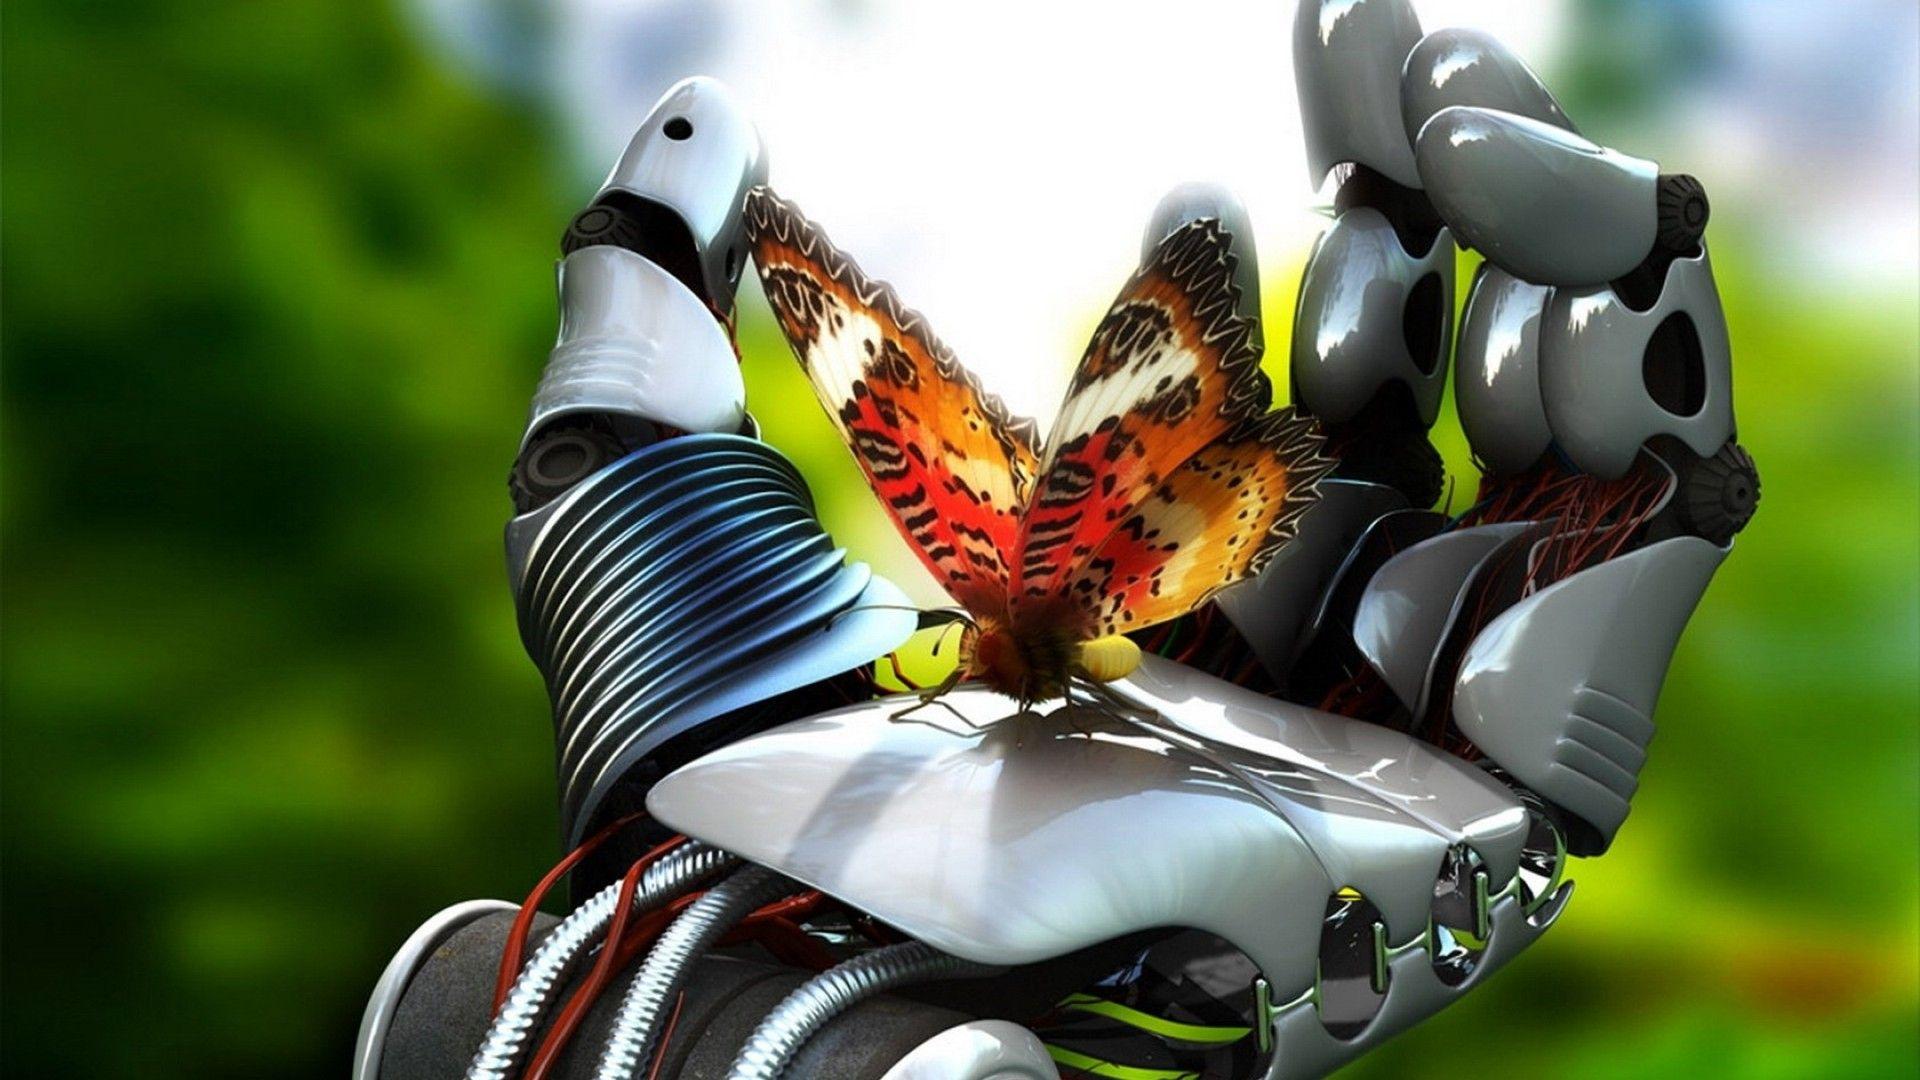 robot hand butterfly 3d wallpaper images full hd free #78928828884